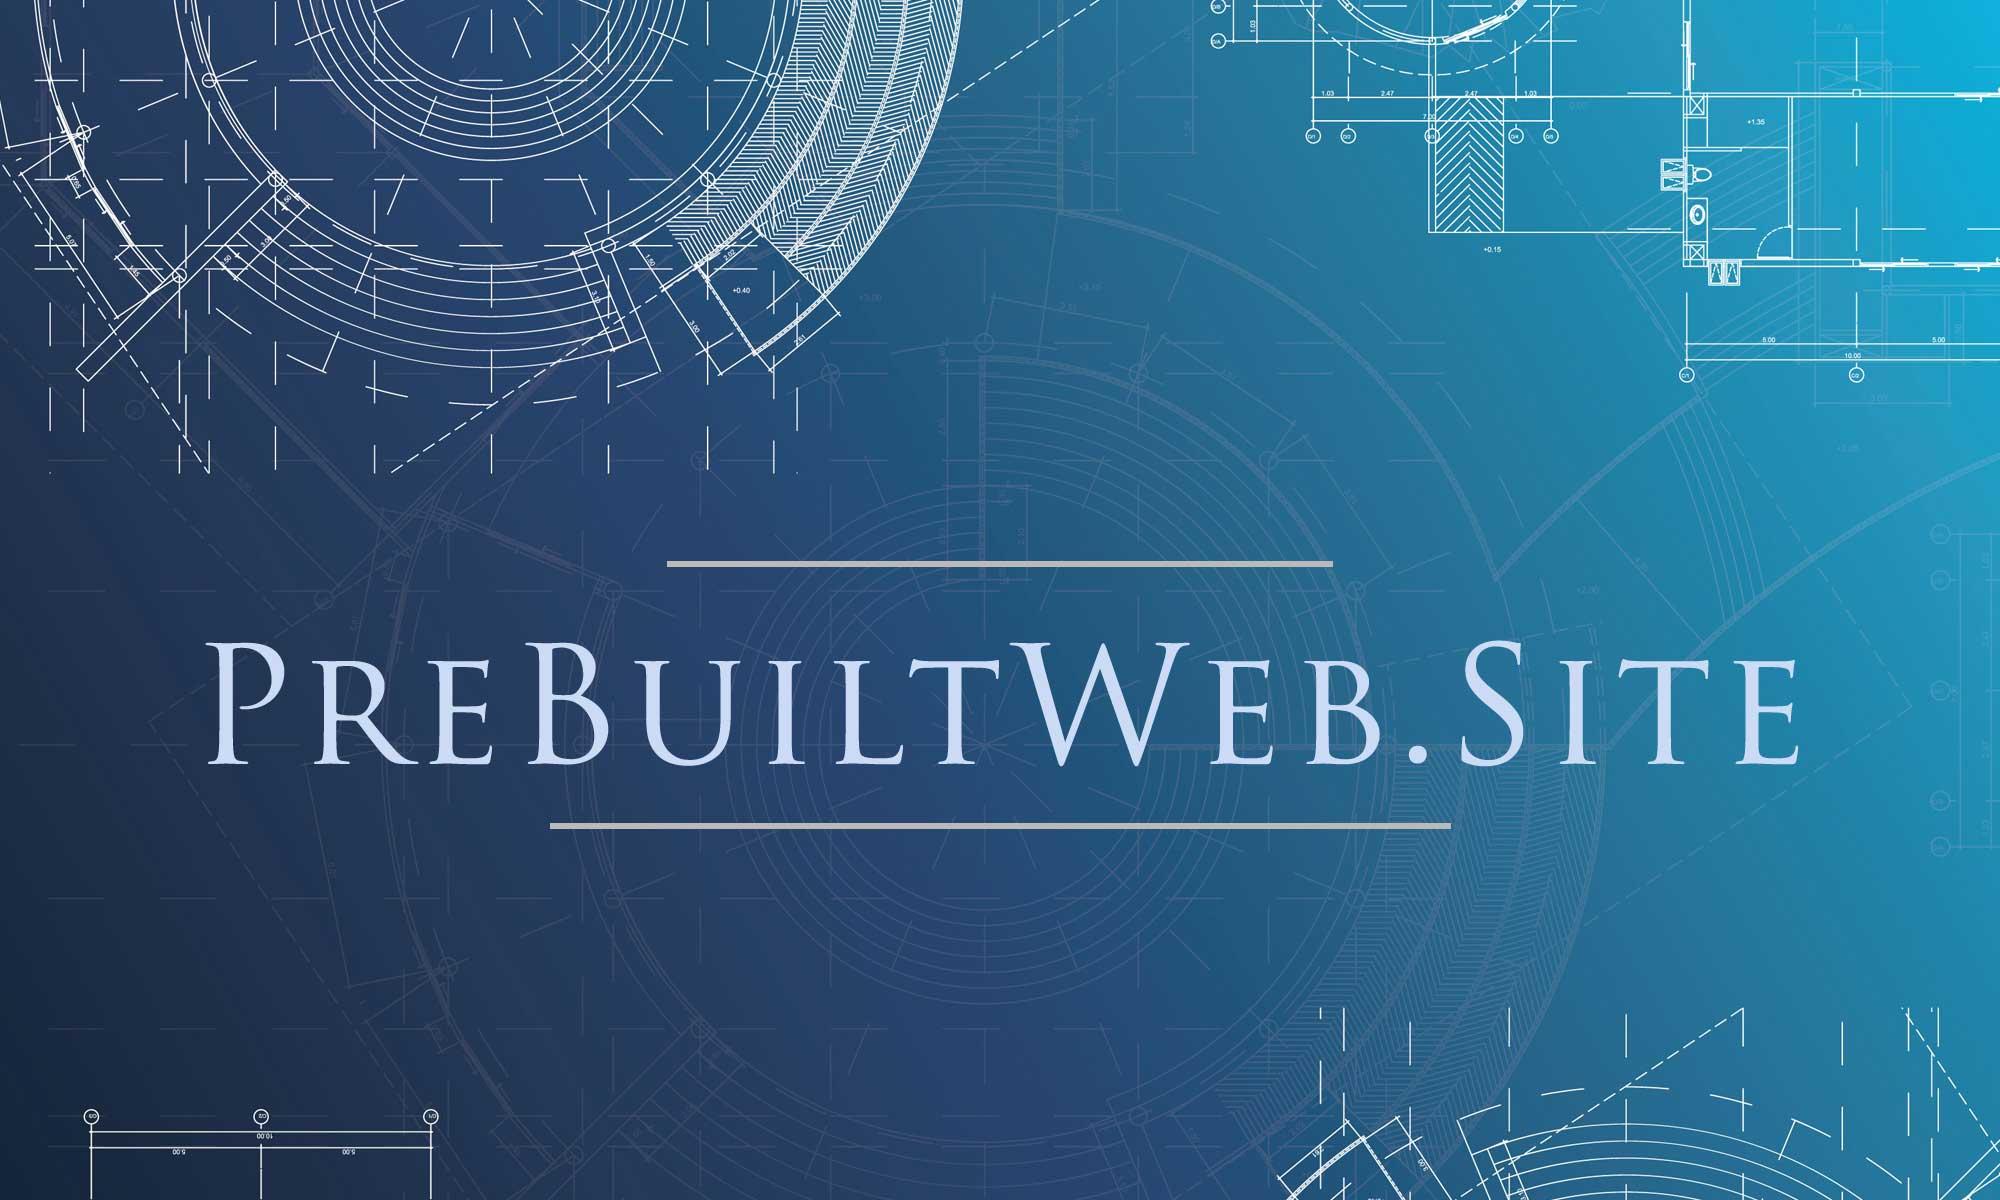 Blueprint logo of PreBuiltWebSite